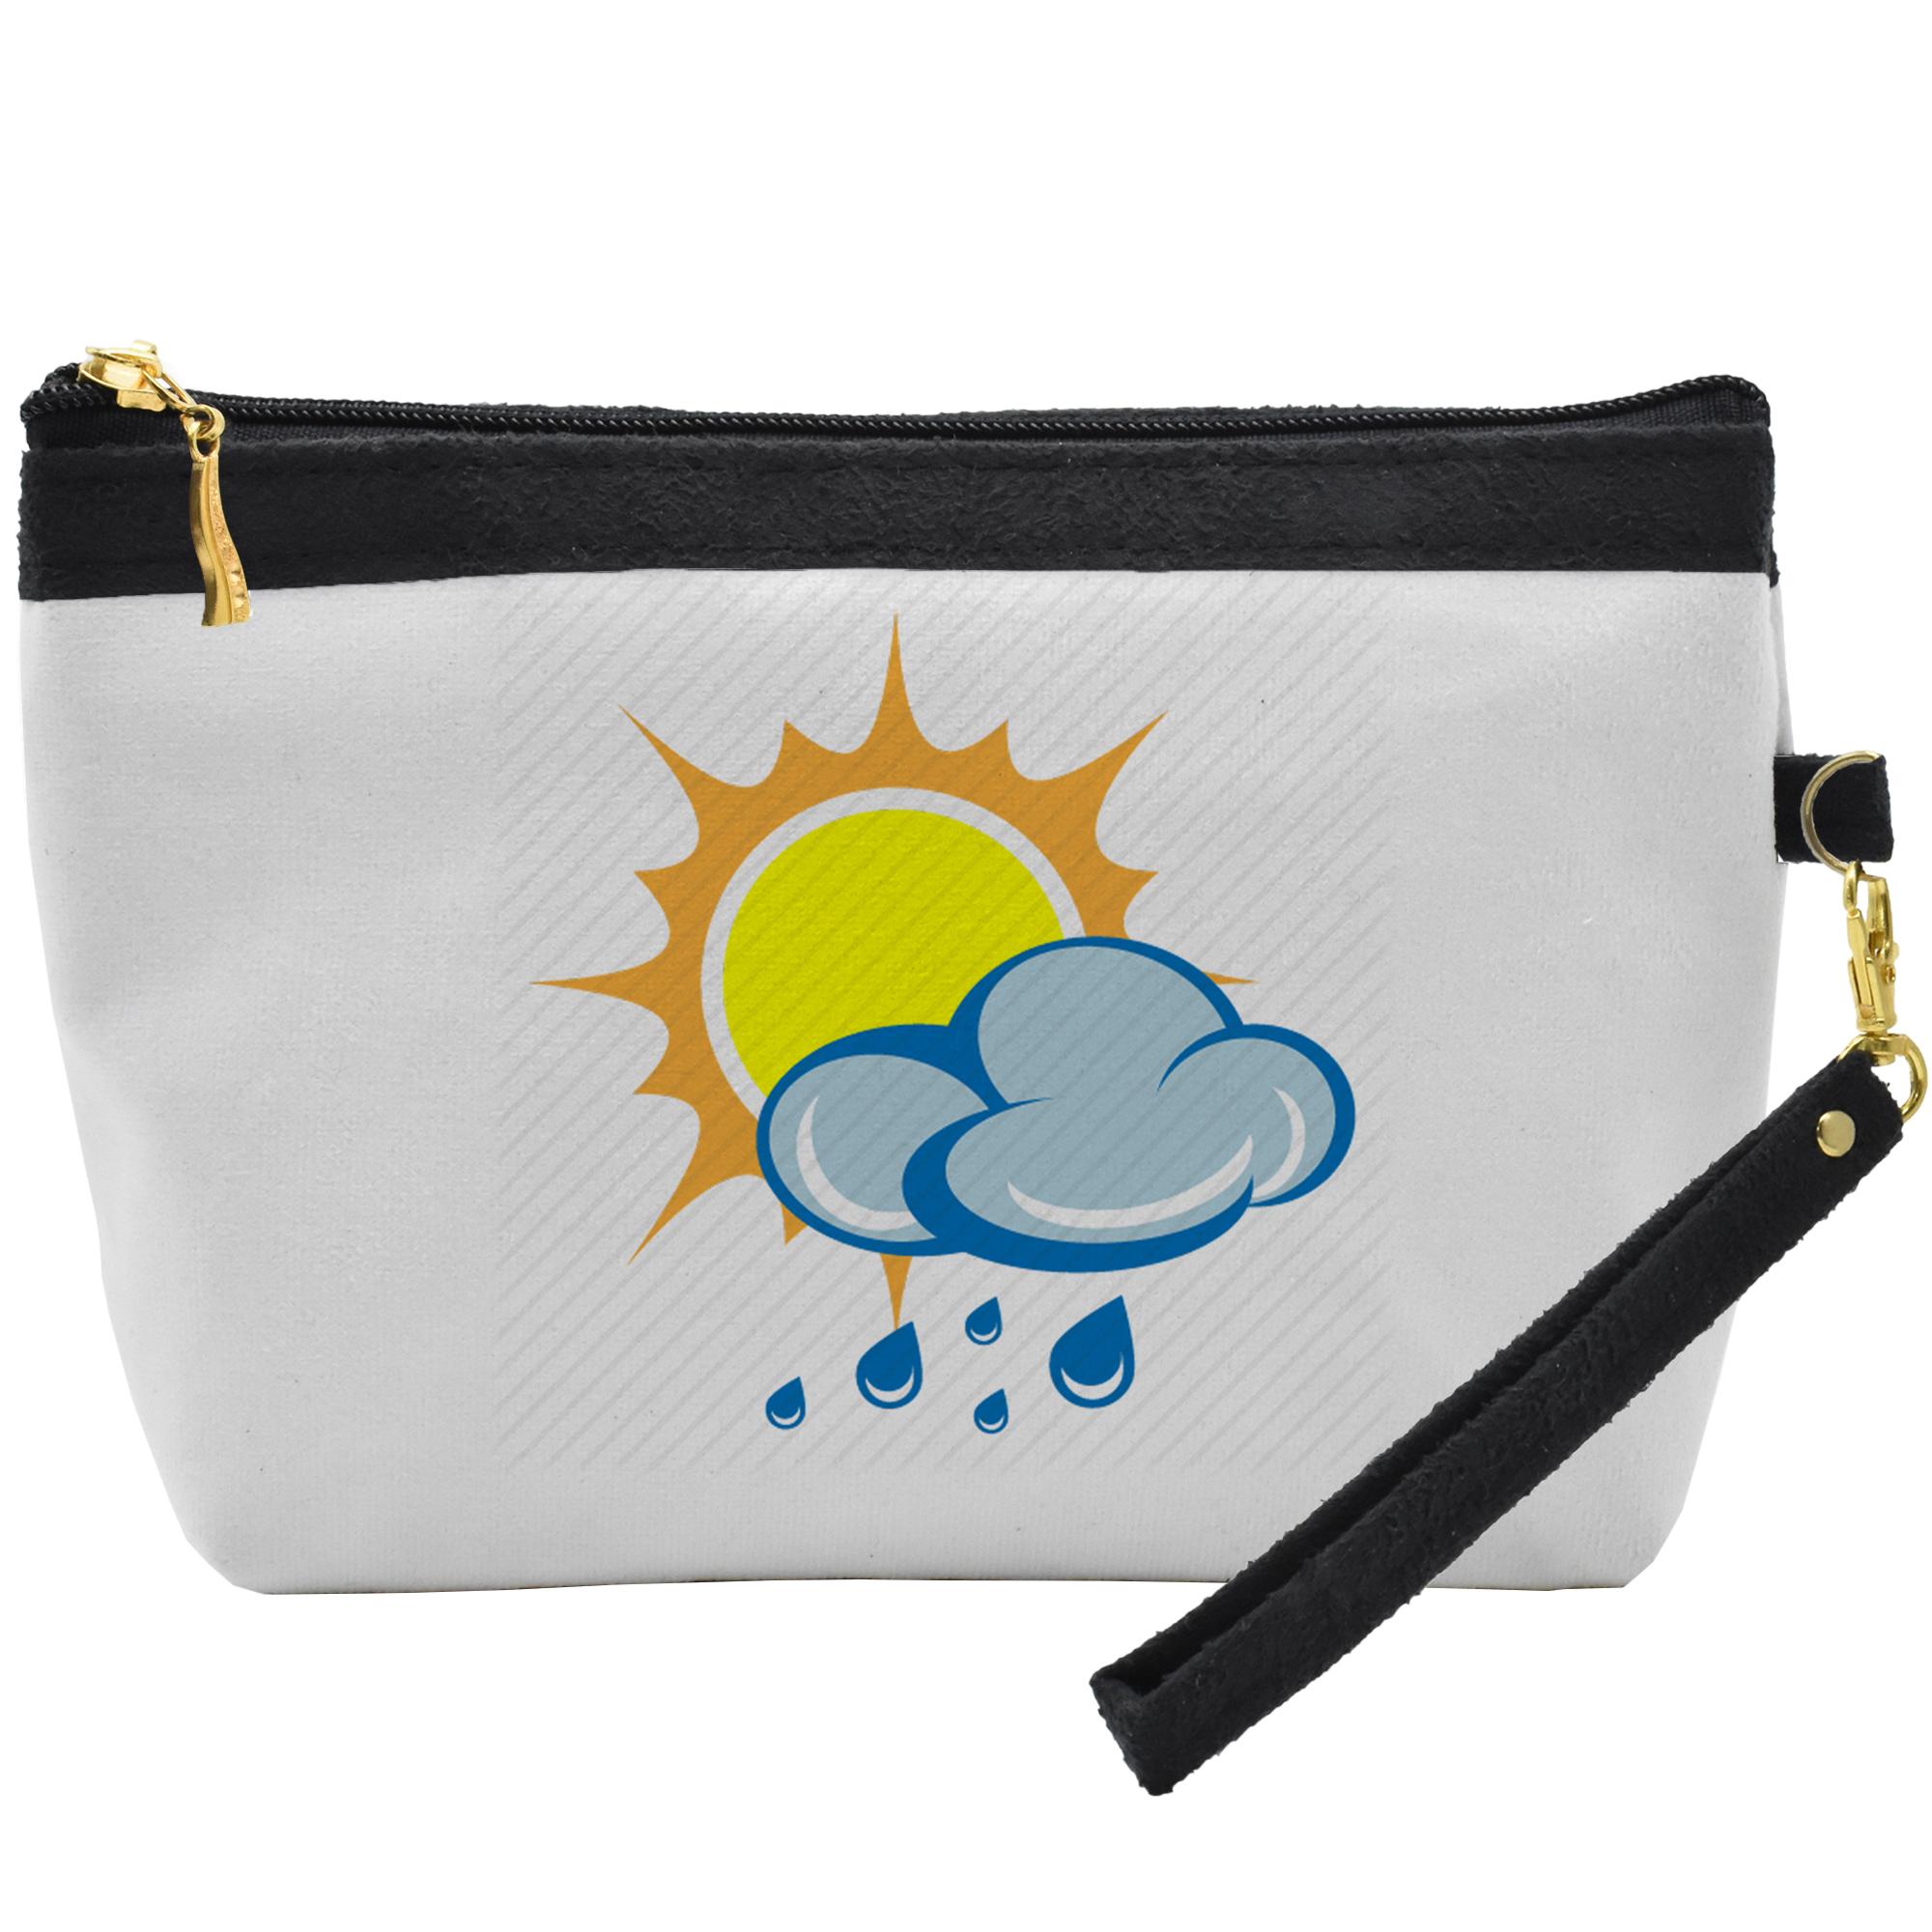 قیمت کیف لوازم آرایشی طرح خورشید و ابر کد C28